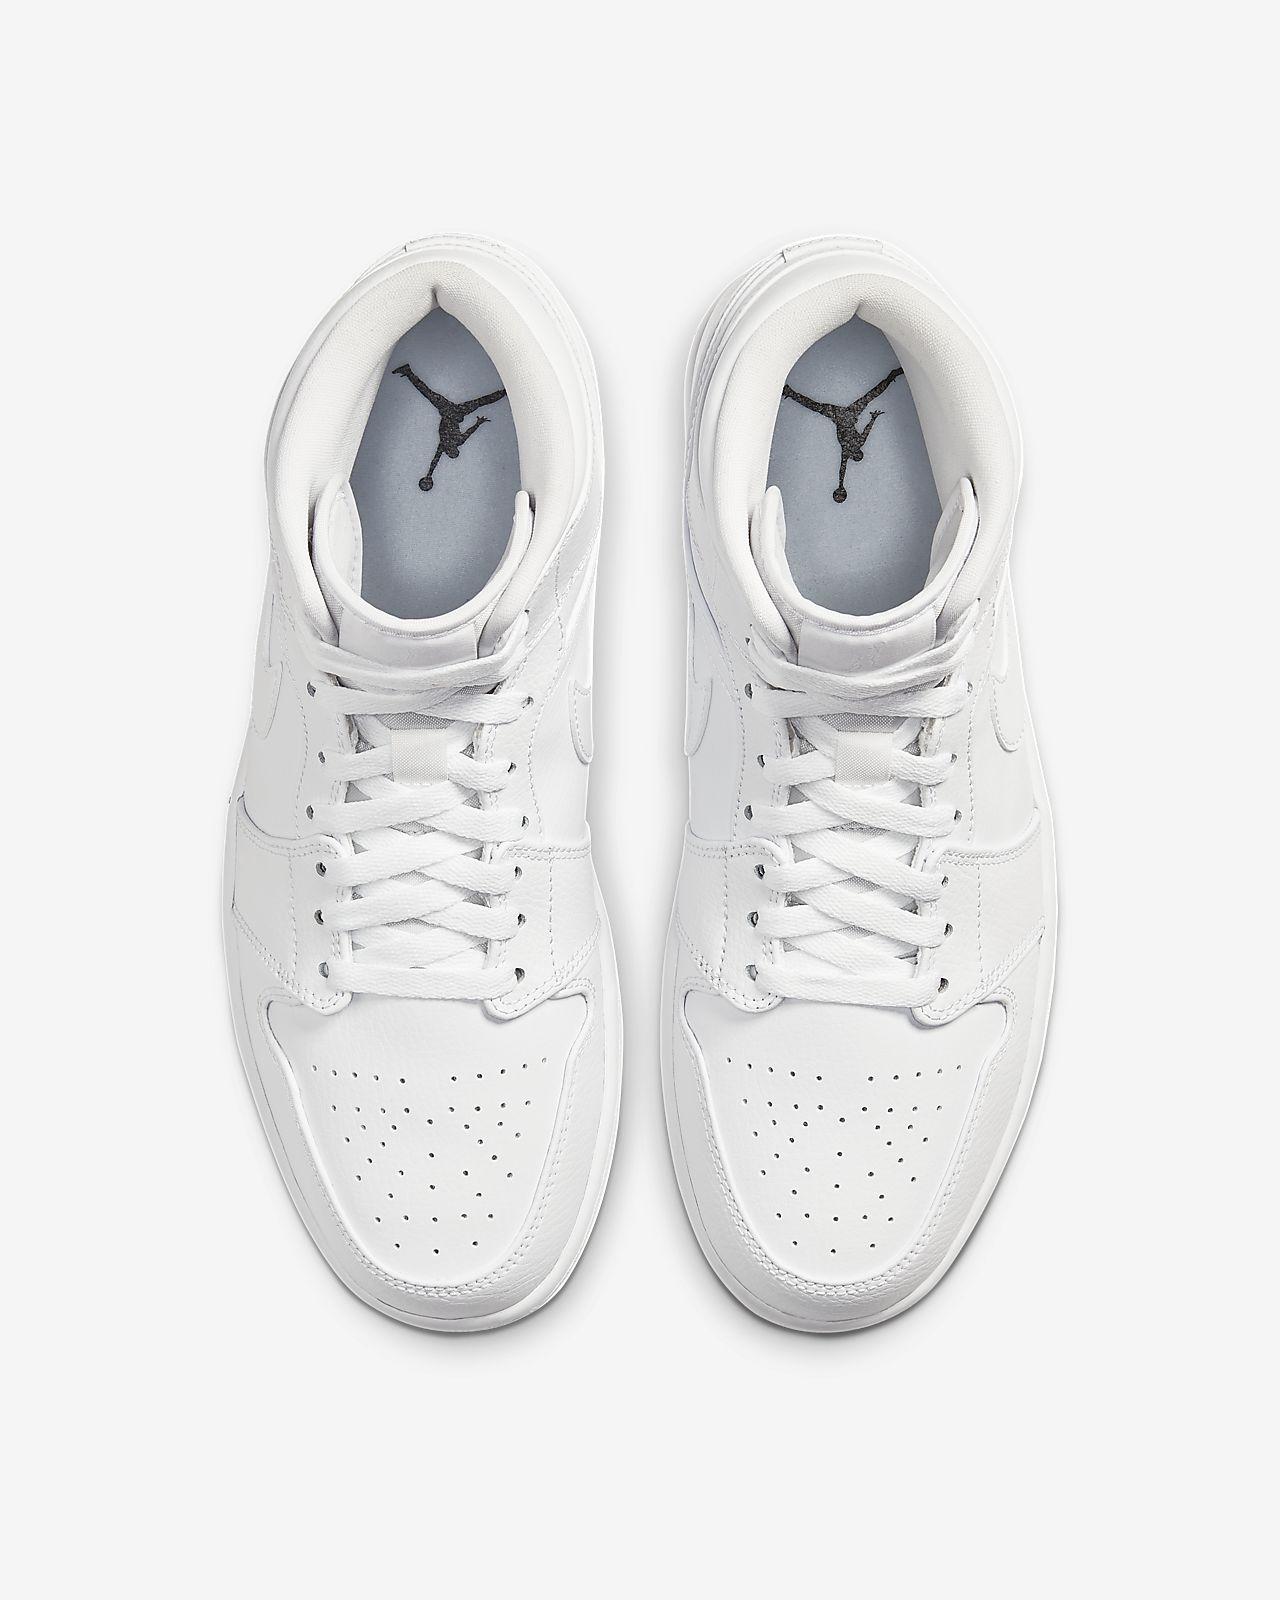 Jordan Nike Kids Air Future Low GG Black//Retro//Anthracite//White Casual Shoe 7 Kids US